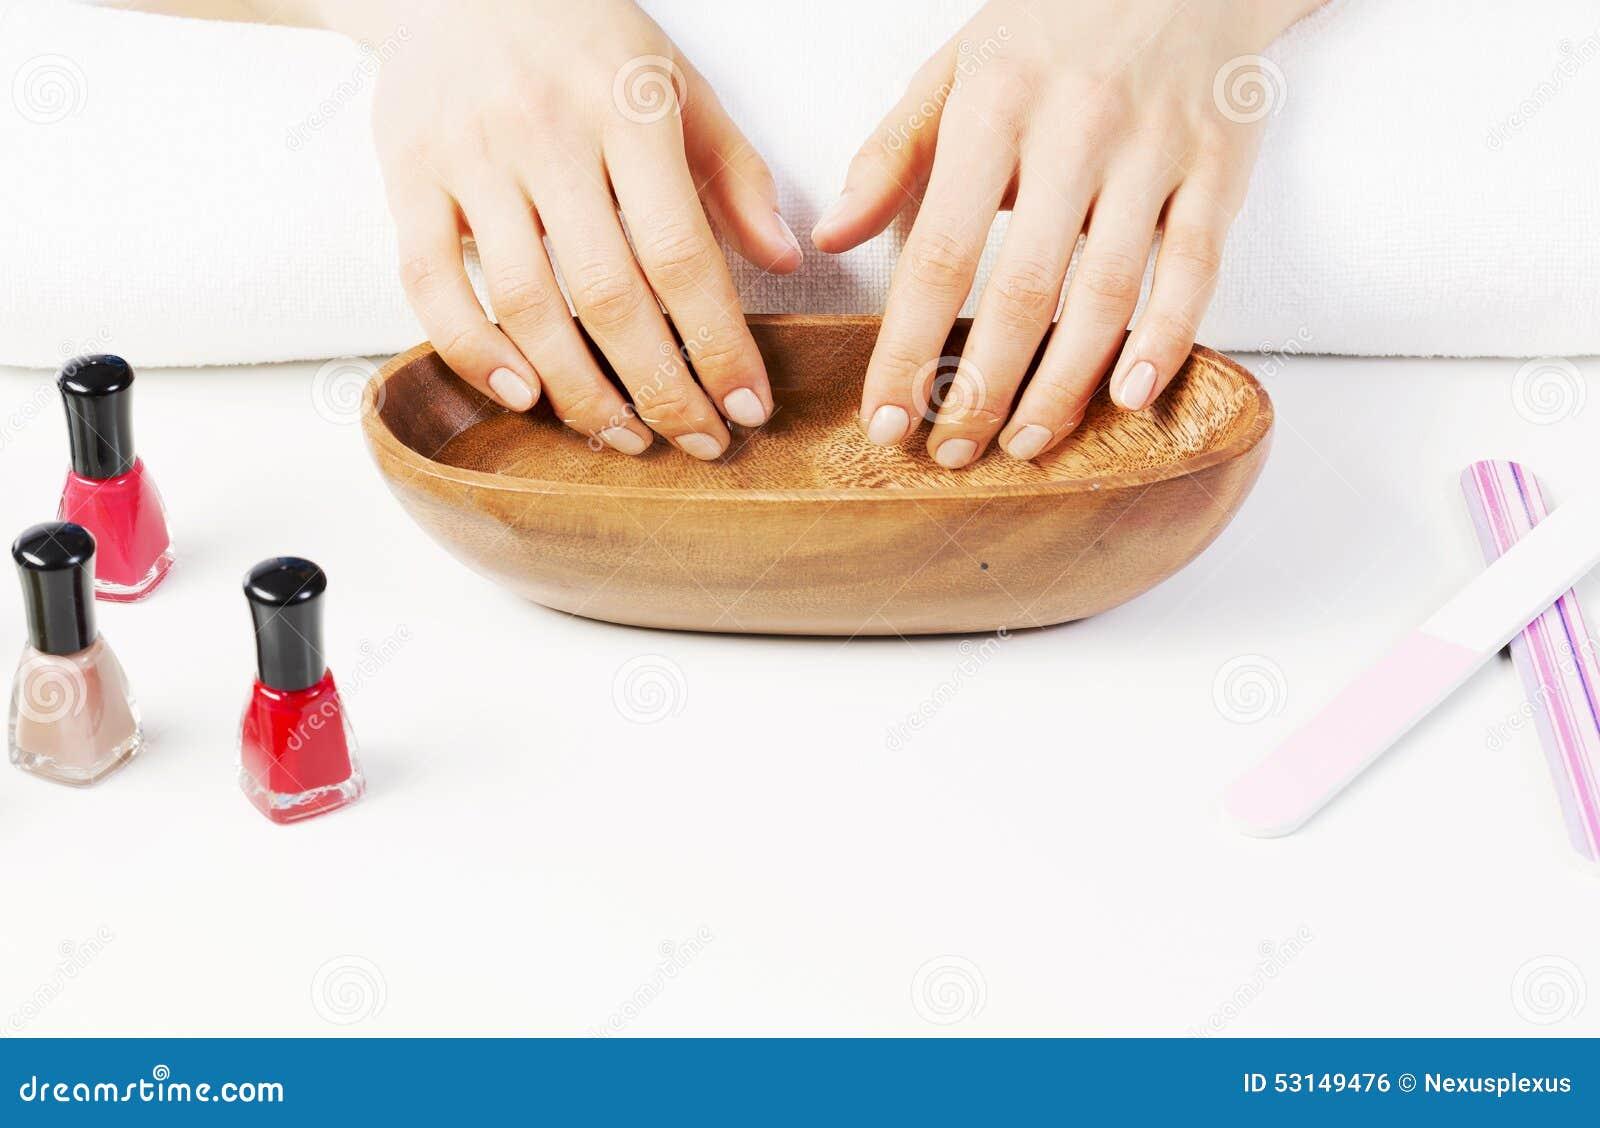 In spa salon stock photo image 53149476 for 24 hour nail salon las vegas nv